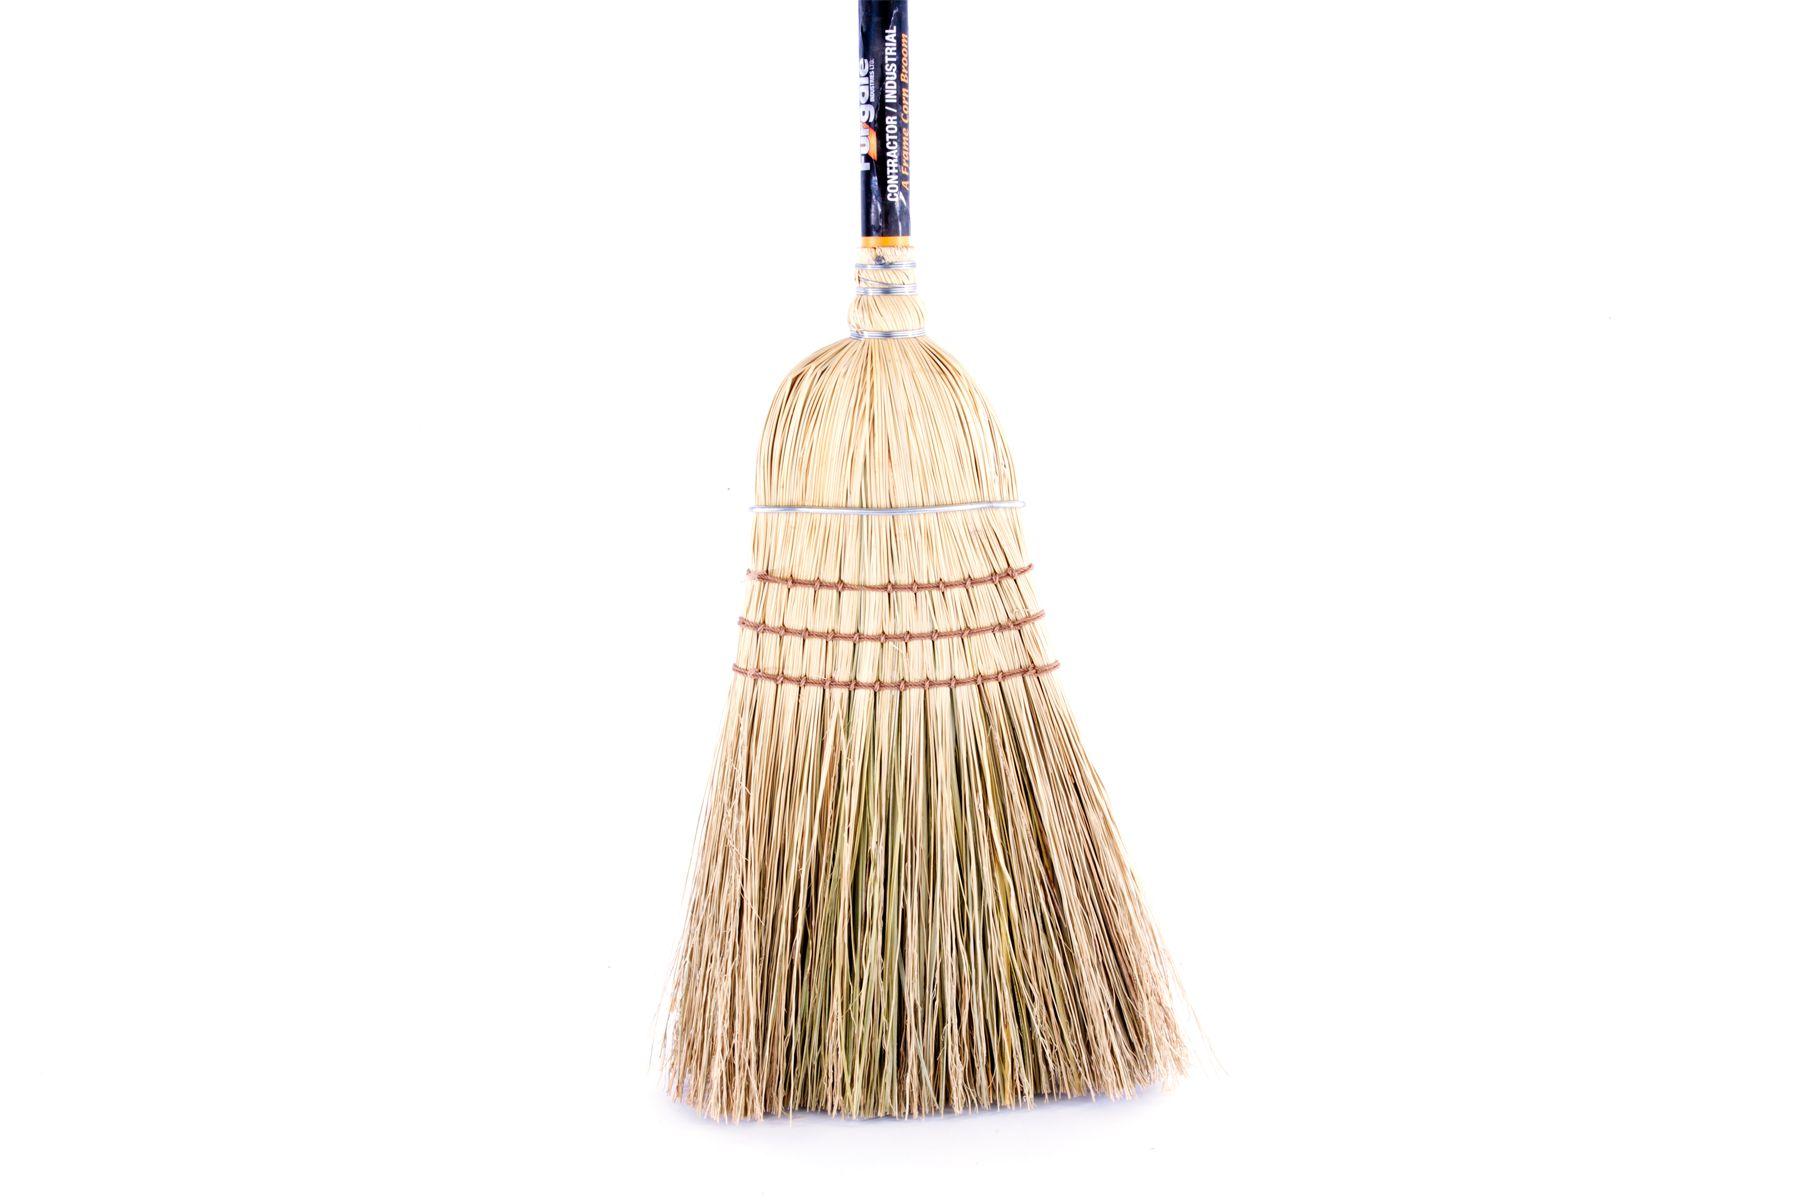 Broom - Corn Broom - A-Frame